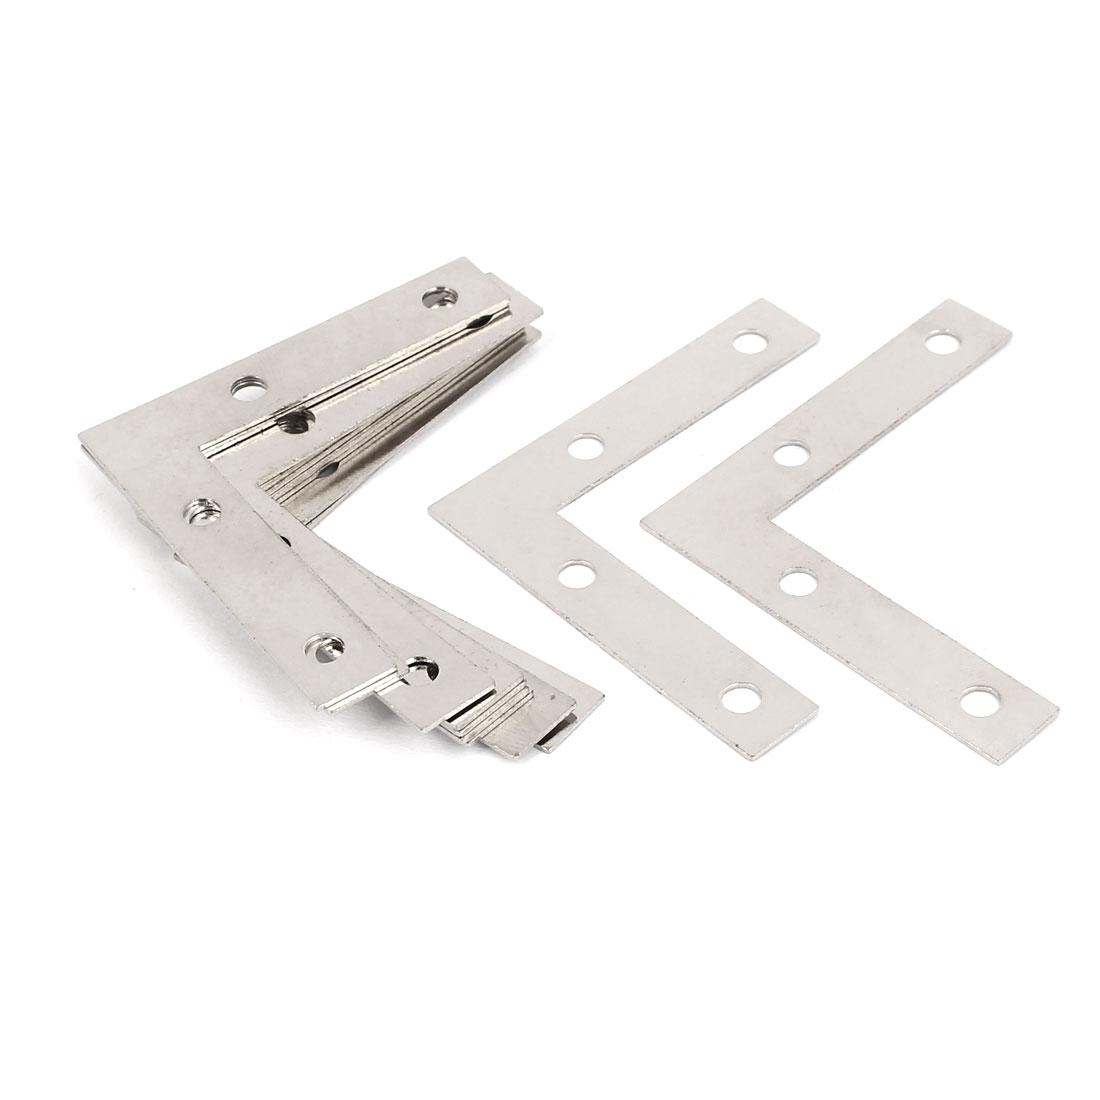 50mm x 50mm Angle Brackets Fixing Flat L Shape Repair Plates Silver Tone 12PCS